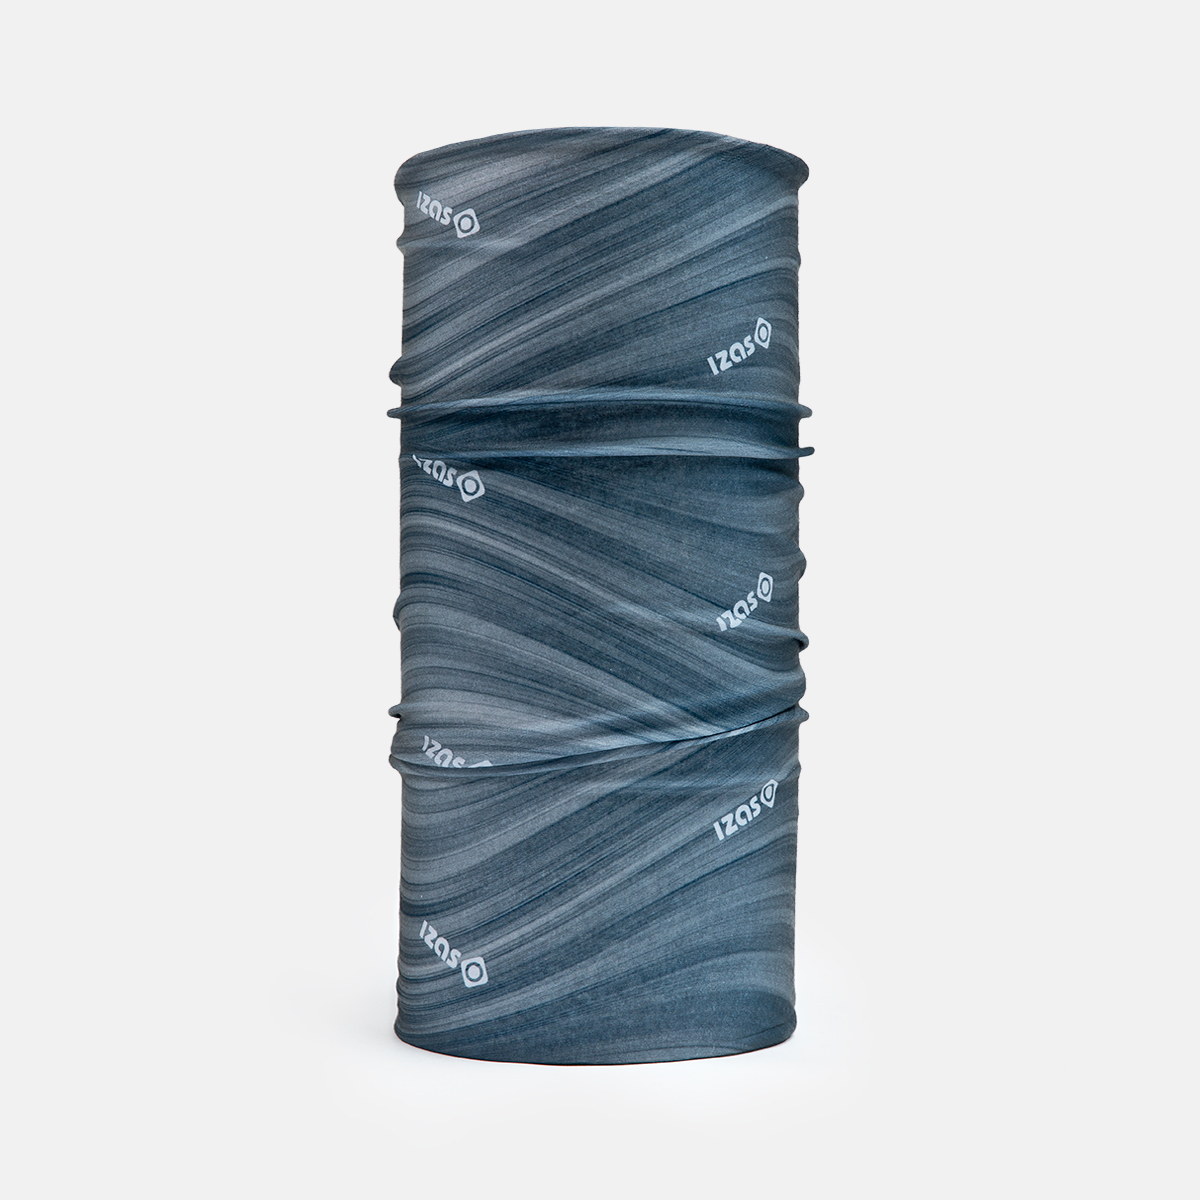 UNISEX'S CARRARA TUBULAR GREY